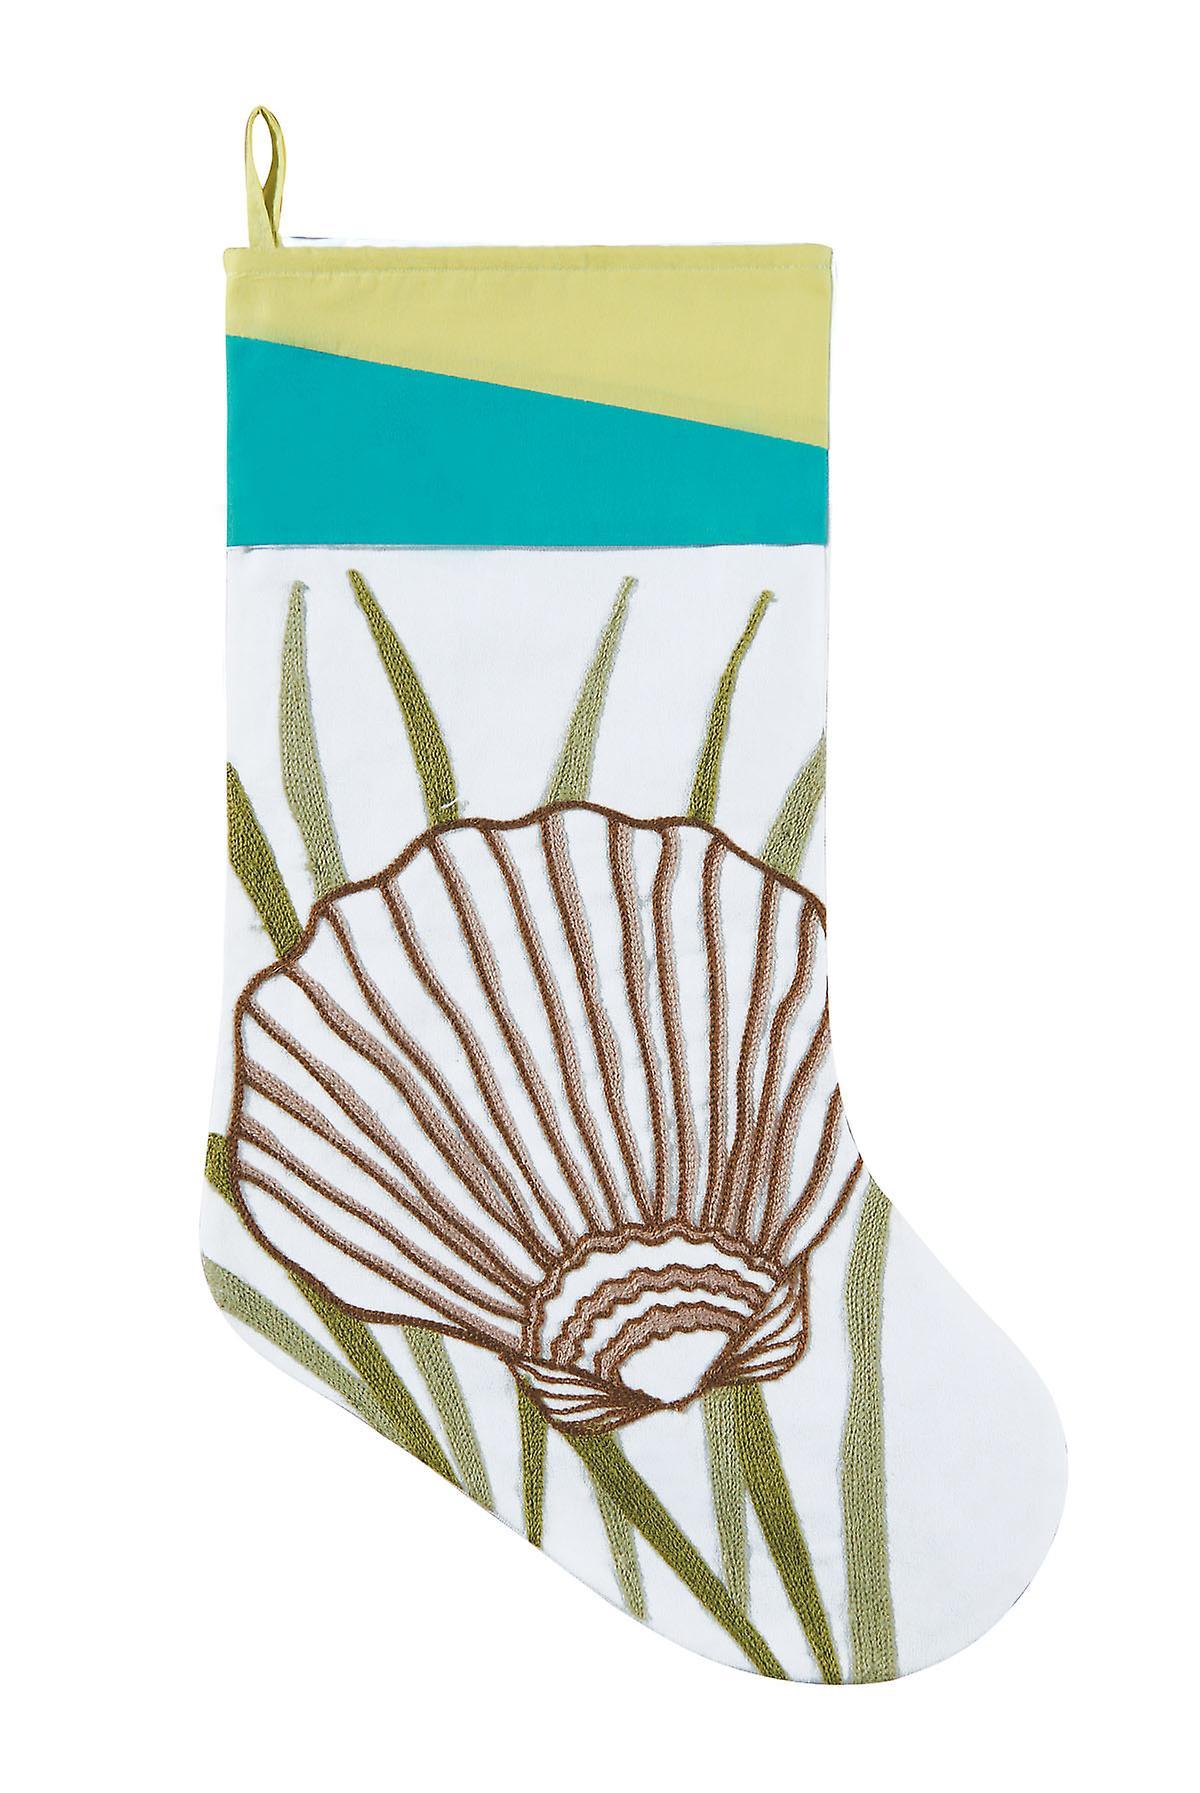 Coastal Rice Stitch Scallop Seashell in Seaweed White Christmas Holiday Stocking